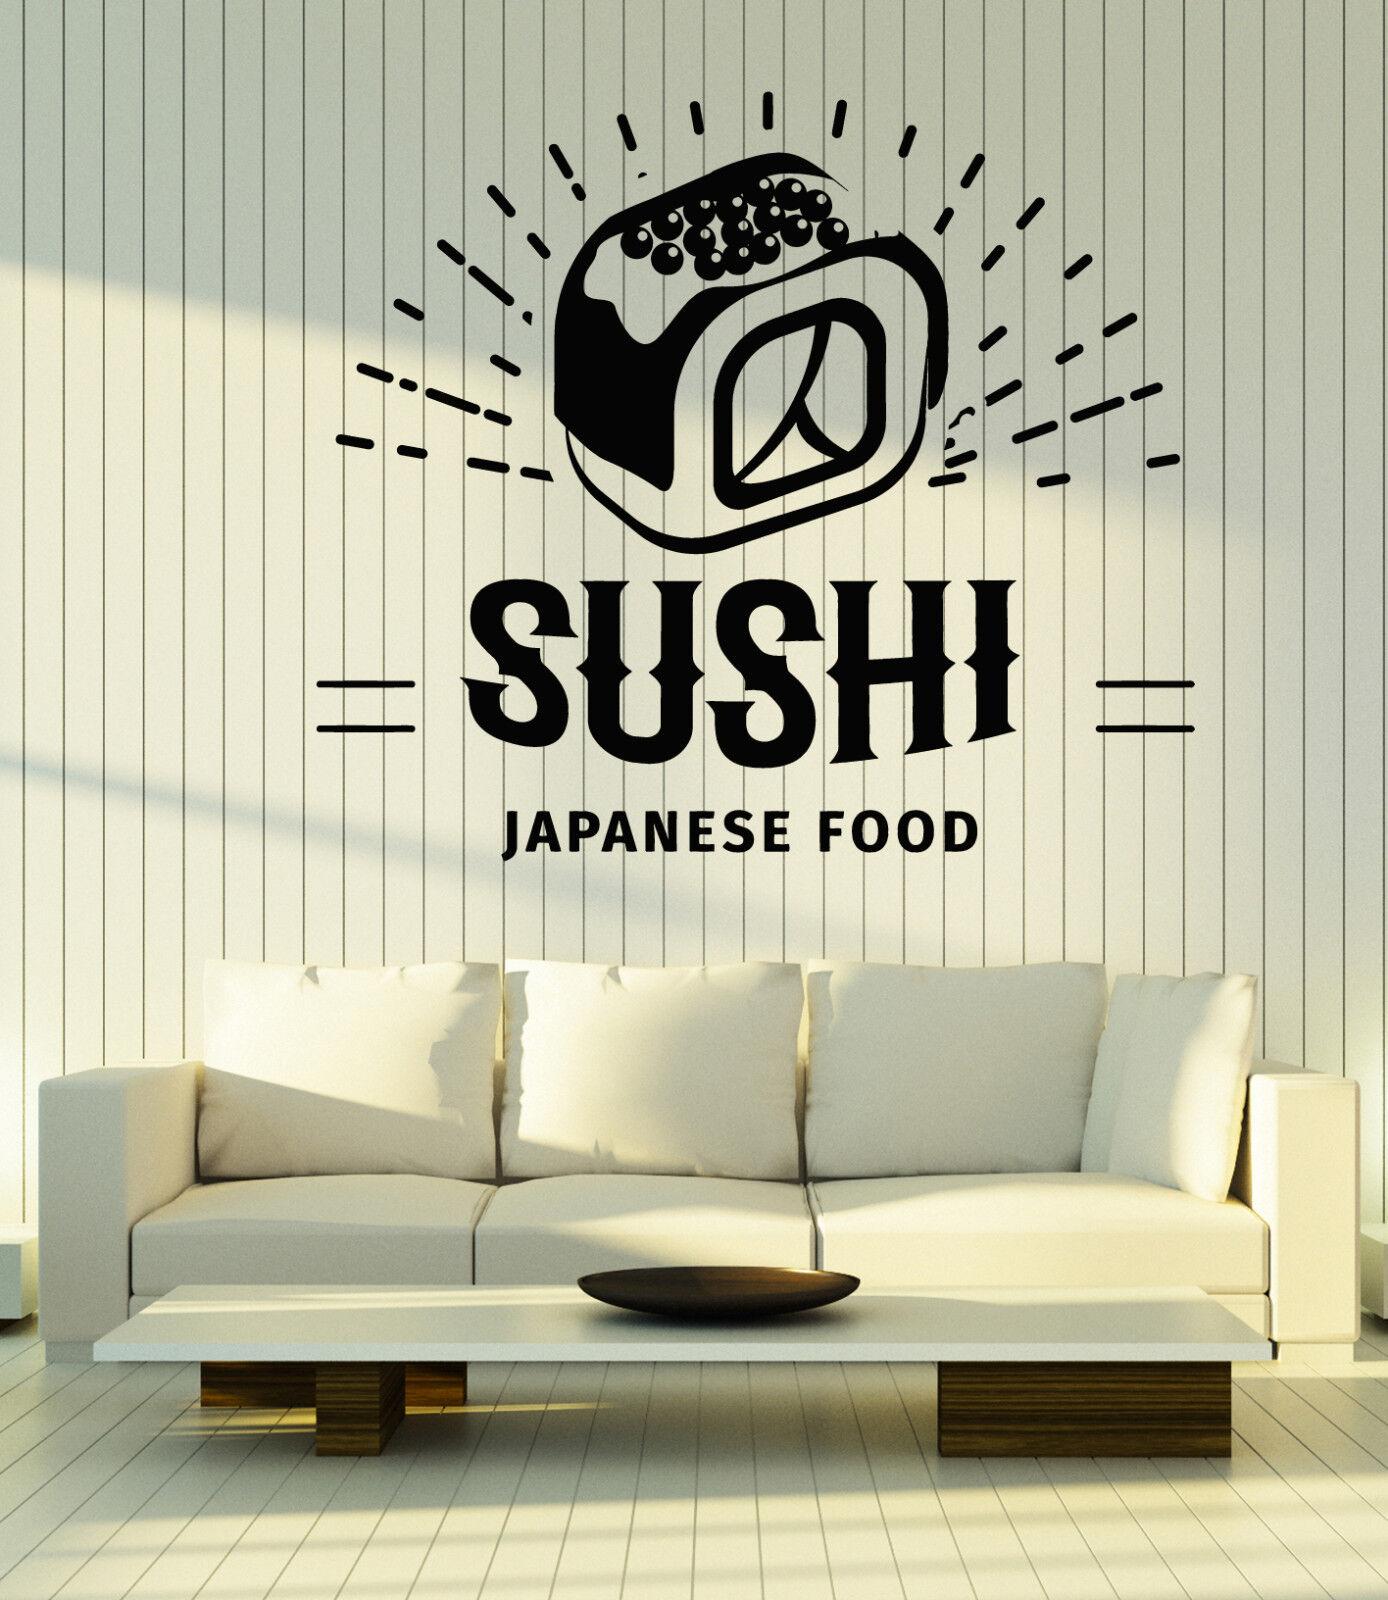 Wall Vinyl Decal Sushi Japanese Food Restaurant Interior Decor z4836